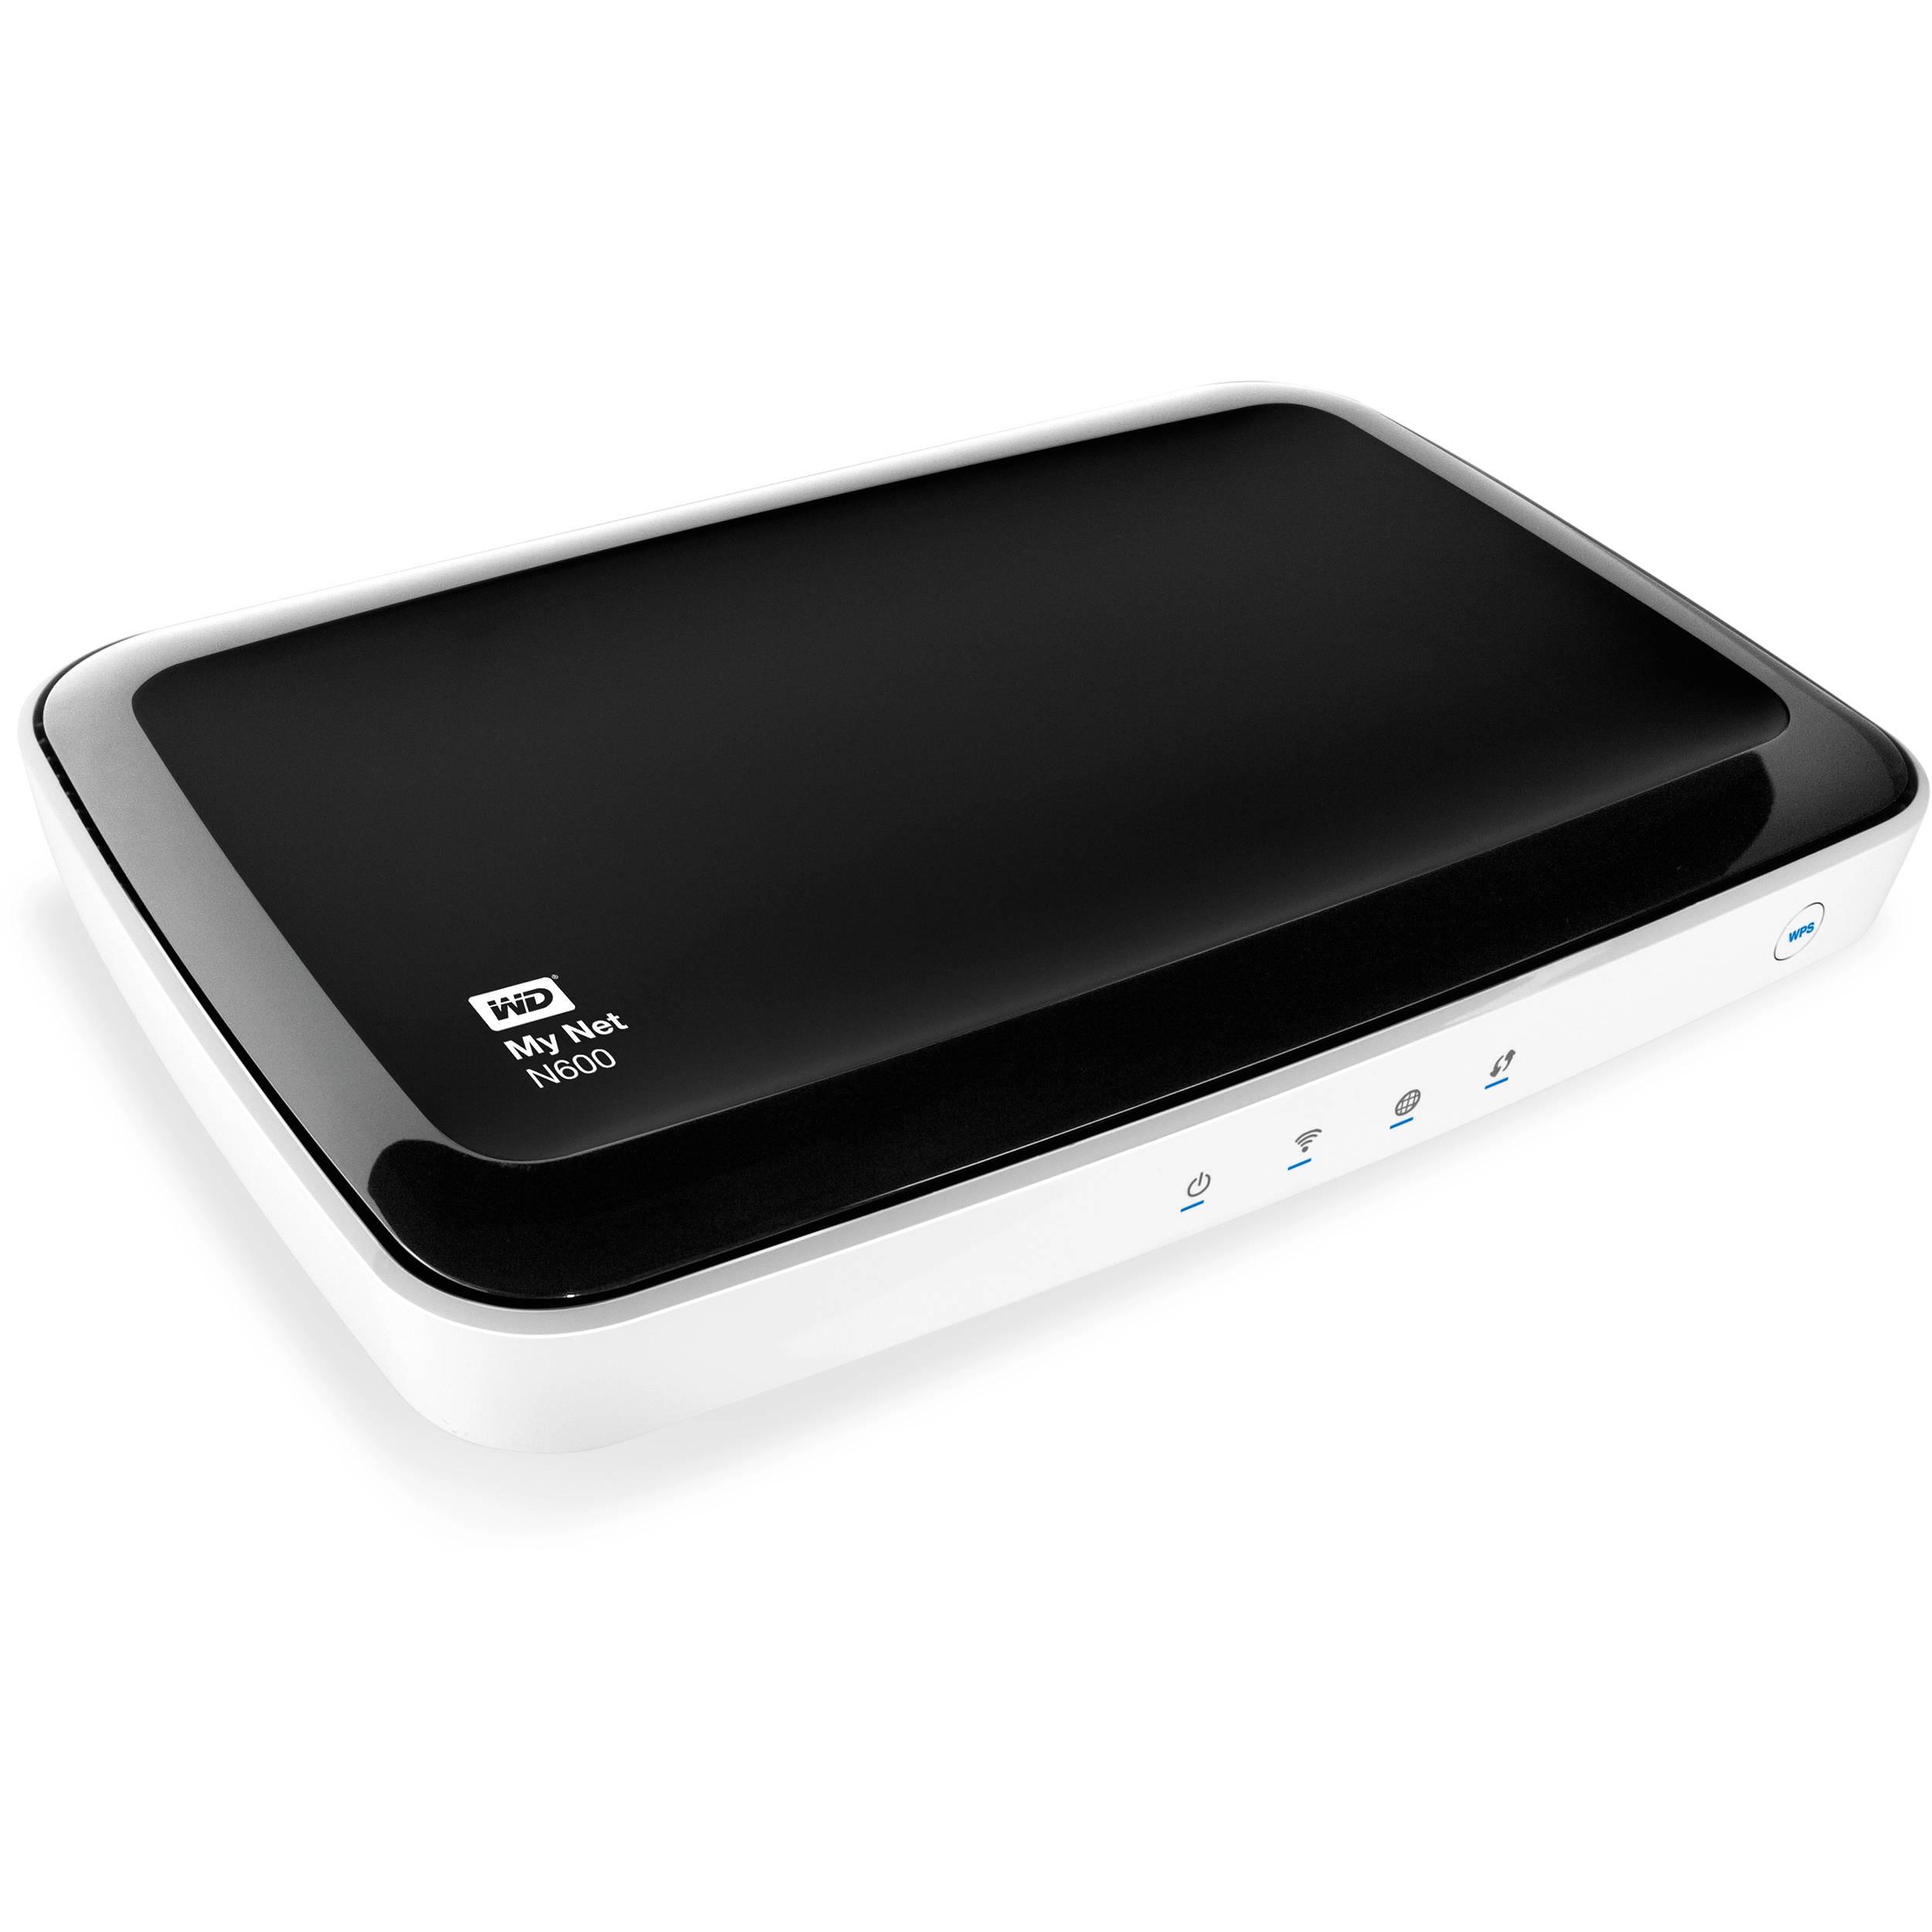 Ipv6 Comcast Seattle Western Digital Wdbeavnwt Hesn My Net N Dual